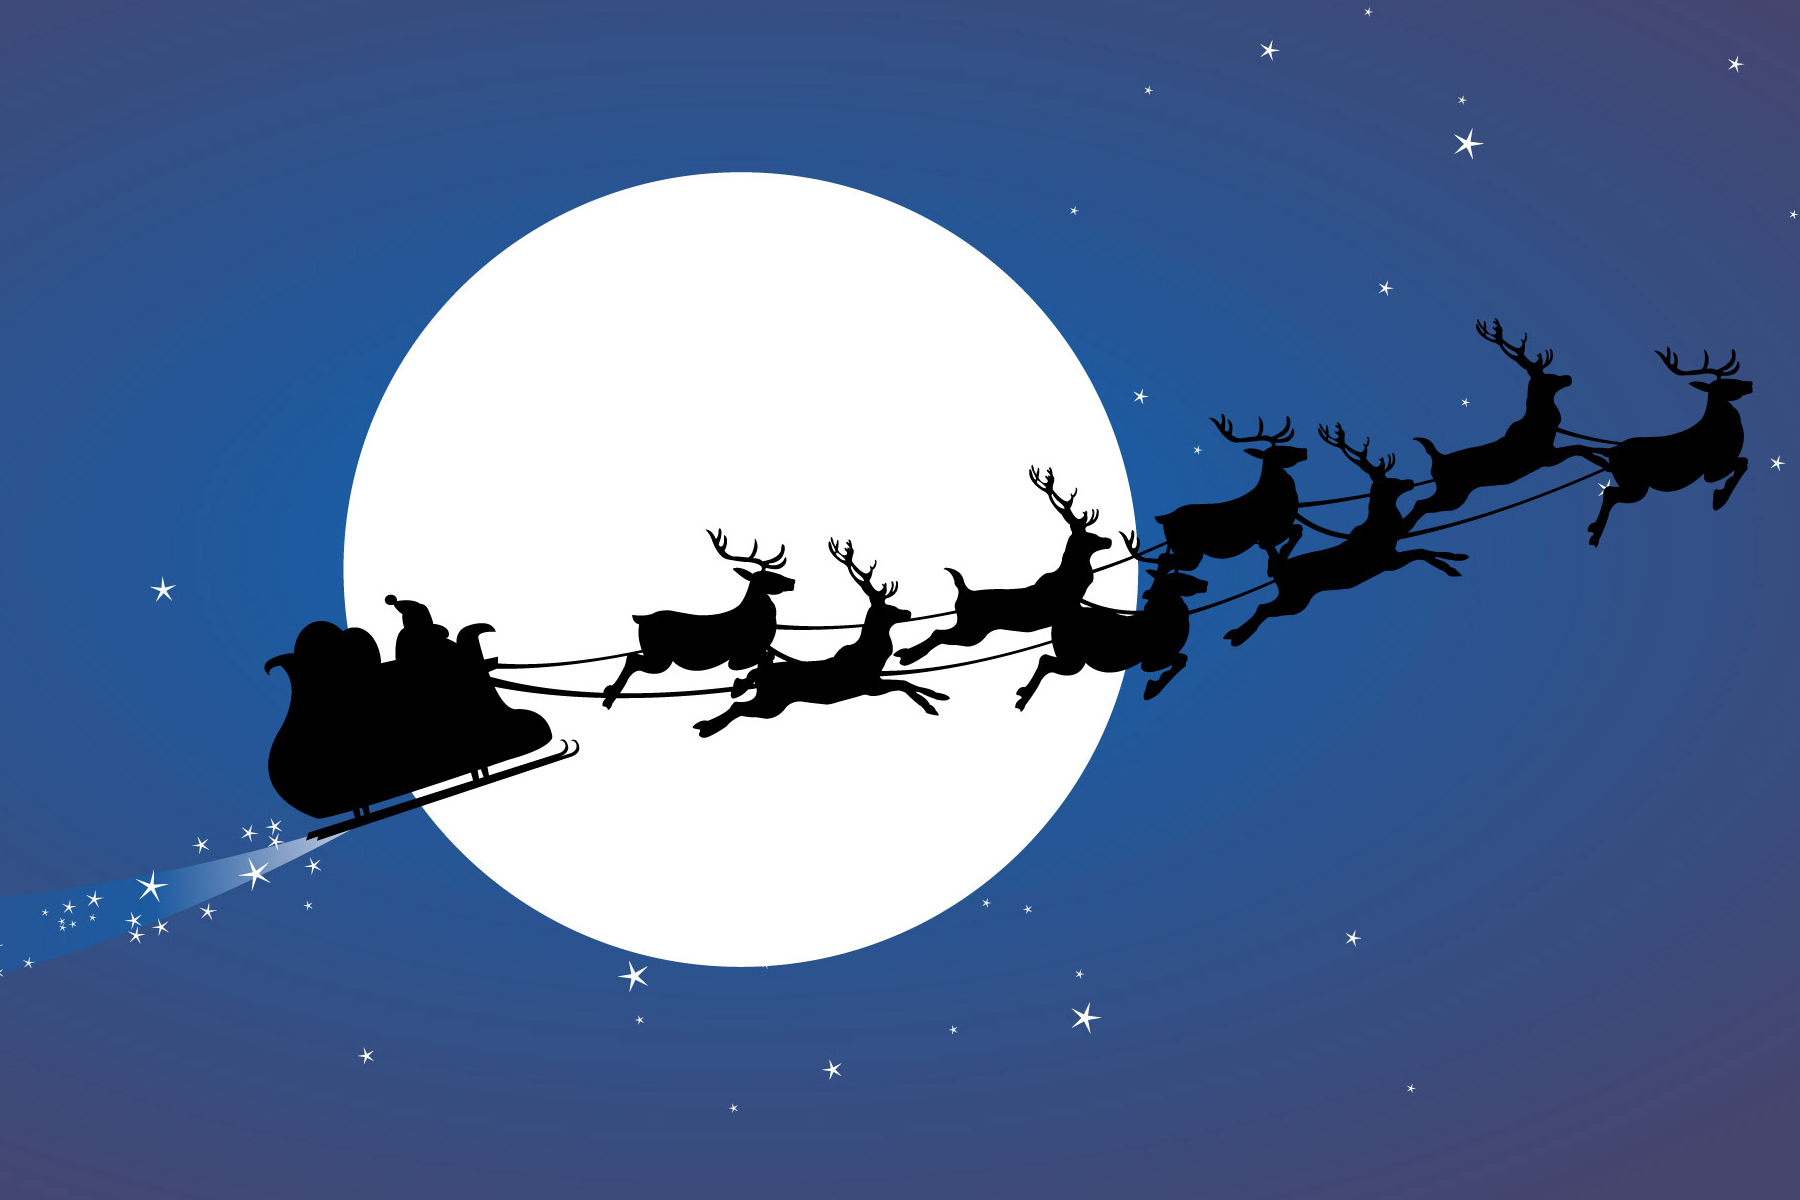 hd santas night flight wallpaper Car Pictures 1800x1200